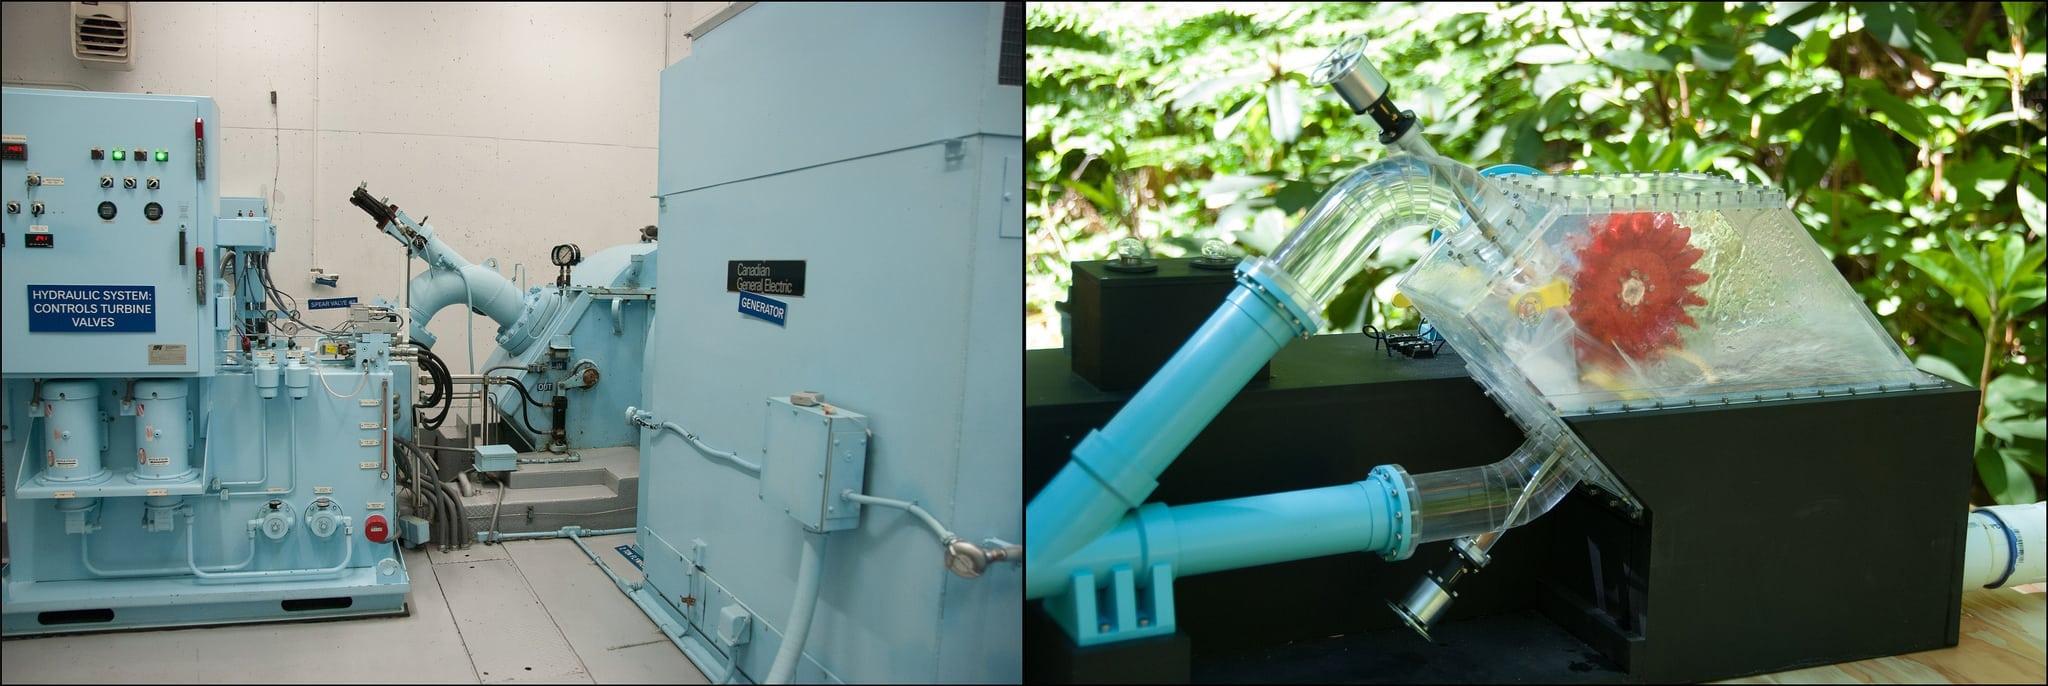 micro-hydropower generator